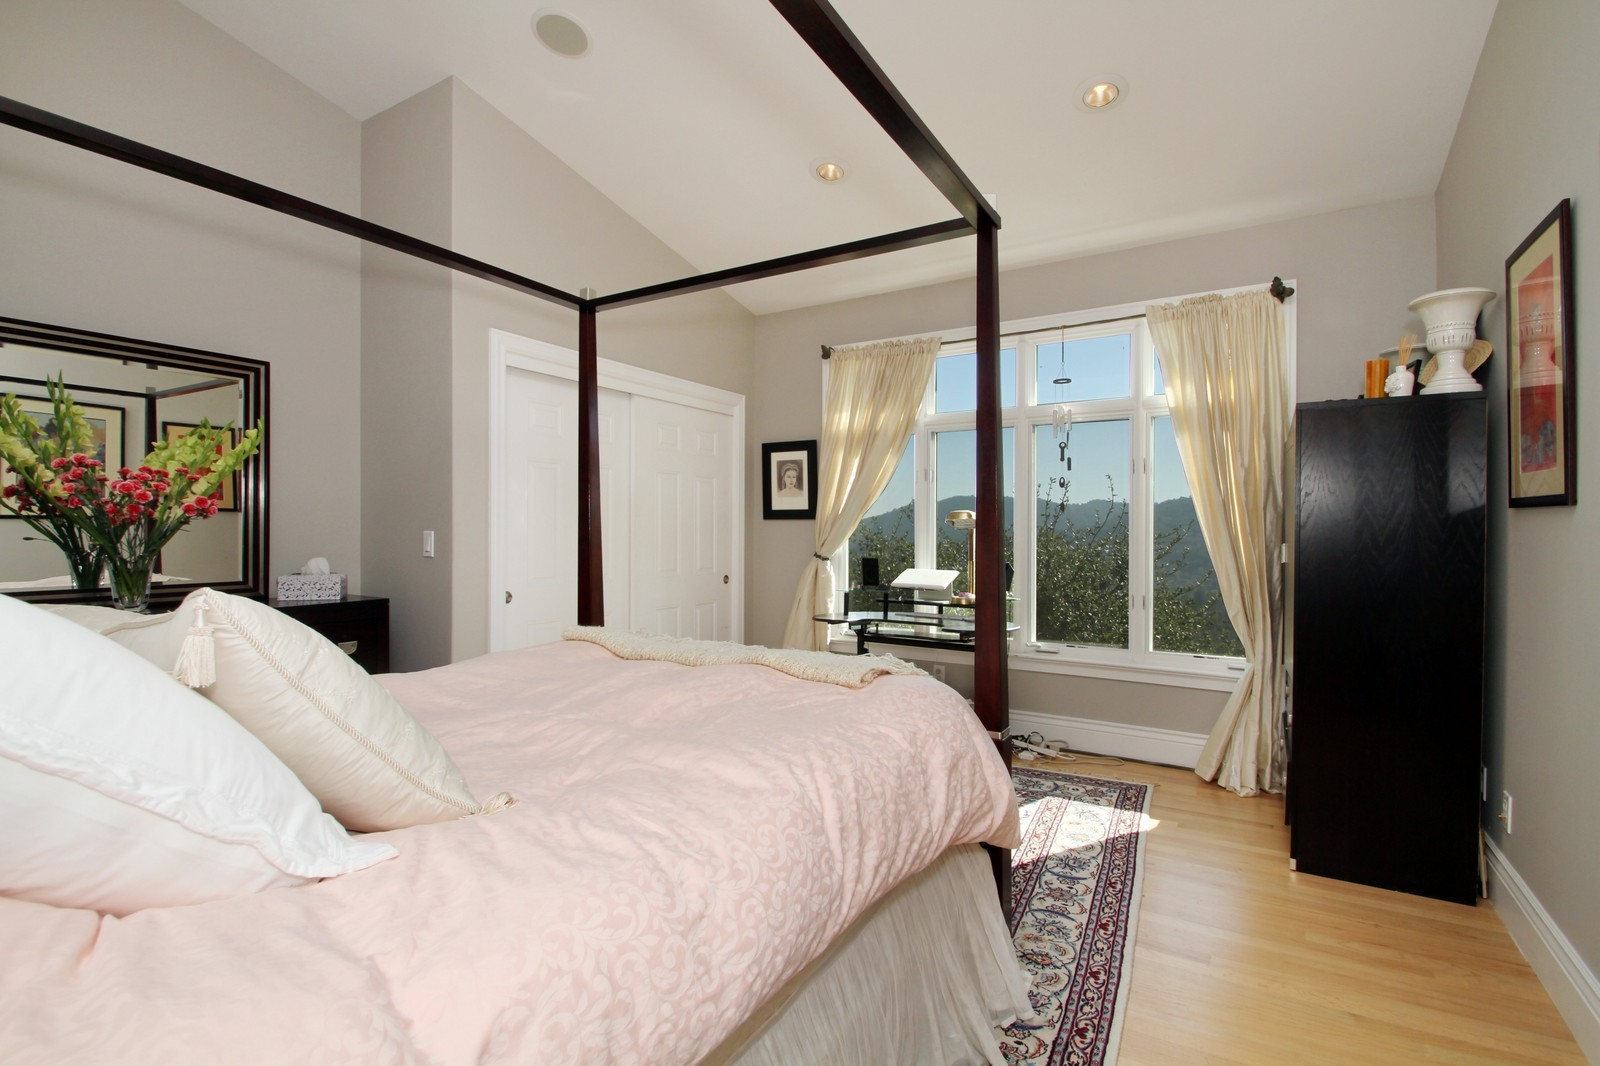 Real Estate Photography - 73 Upper Toyon Drive, Kentfield, CA, 94904 - Bedroom